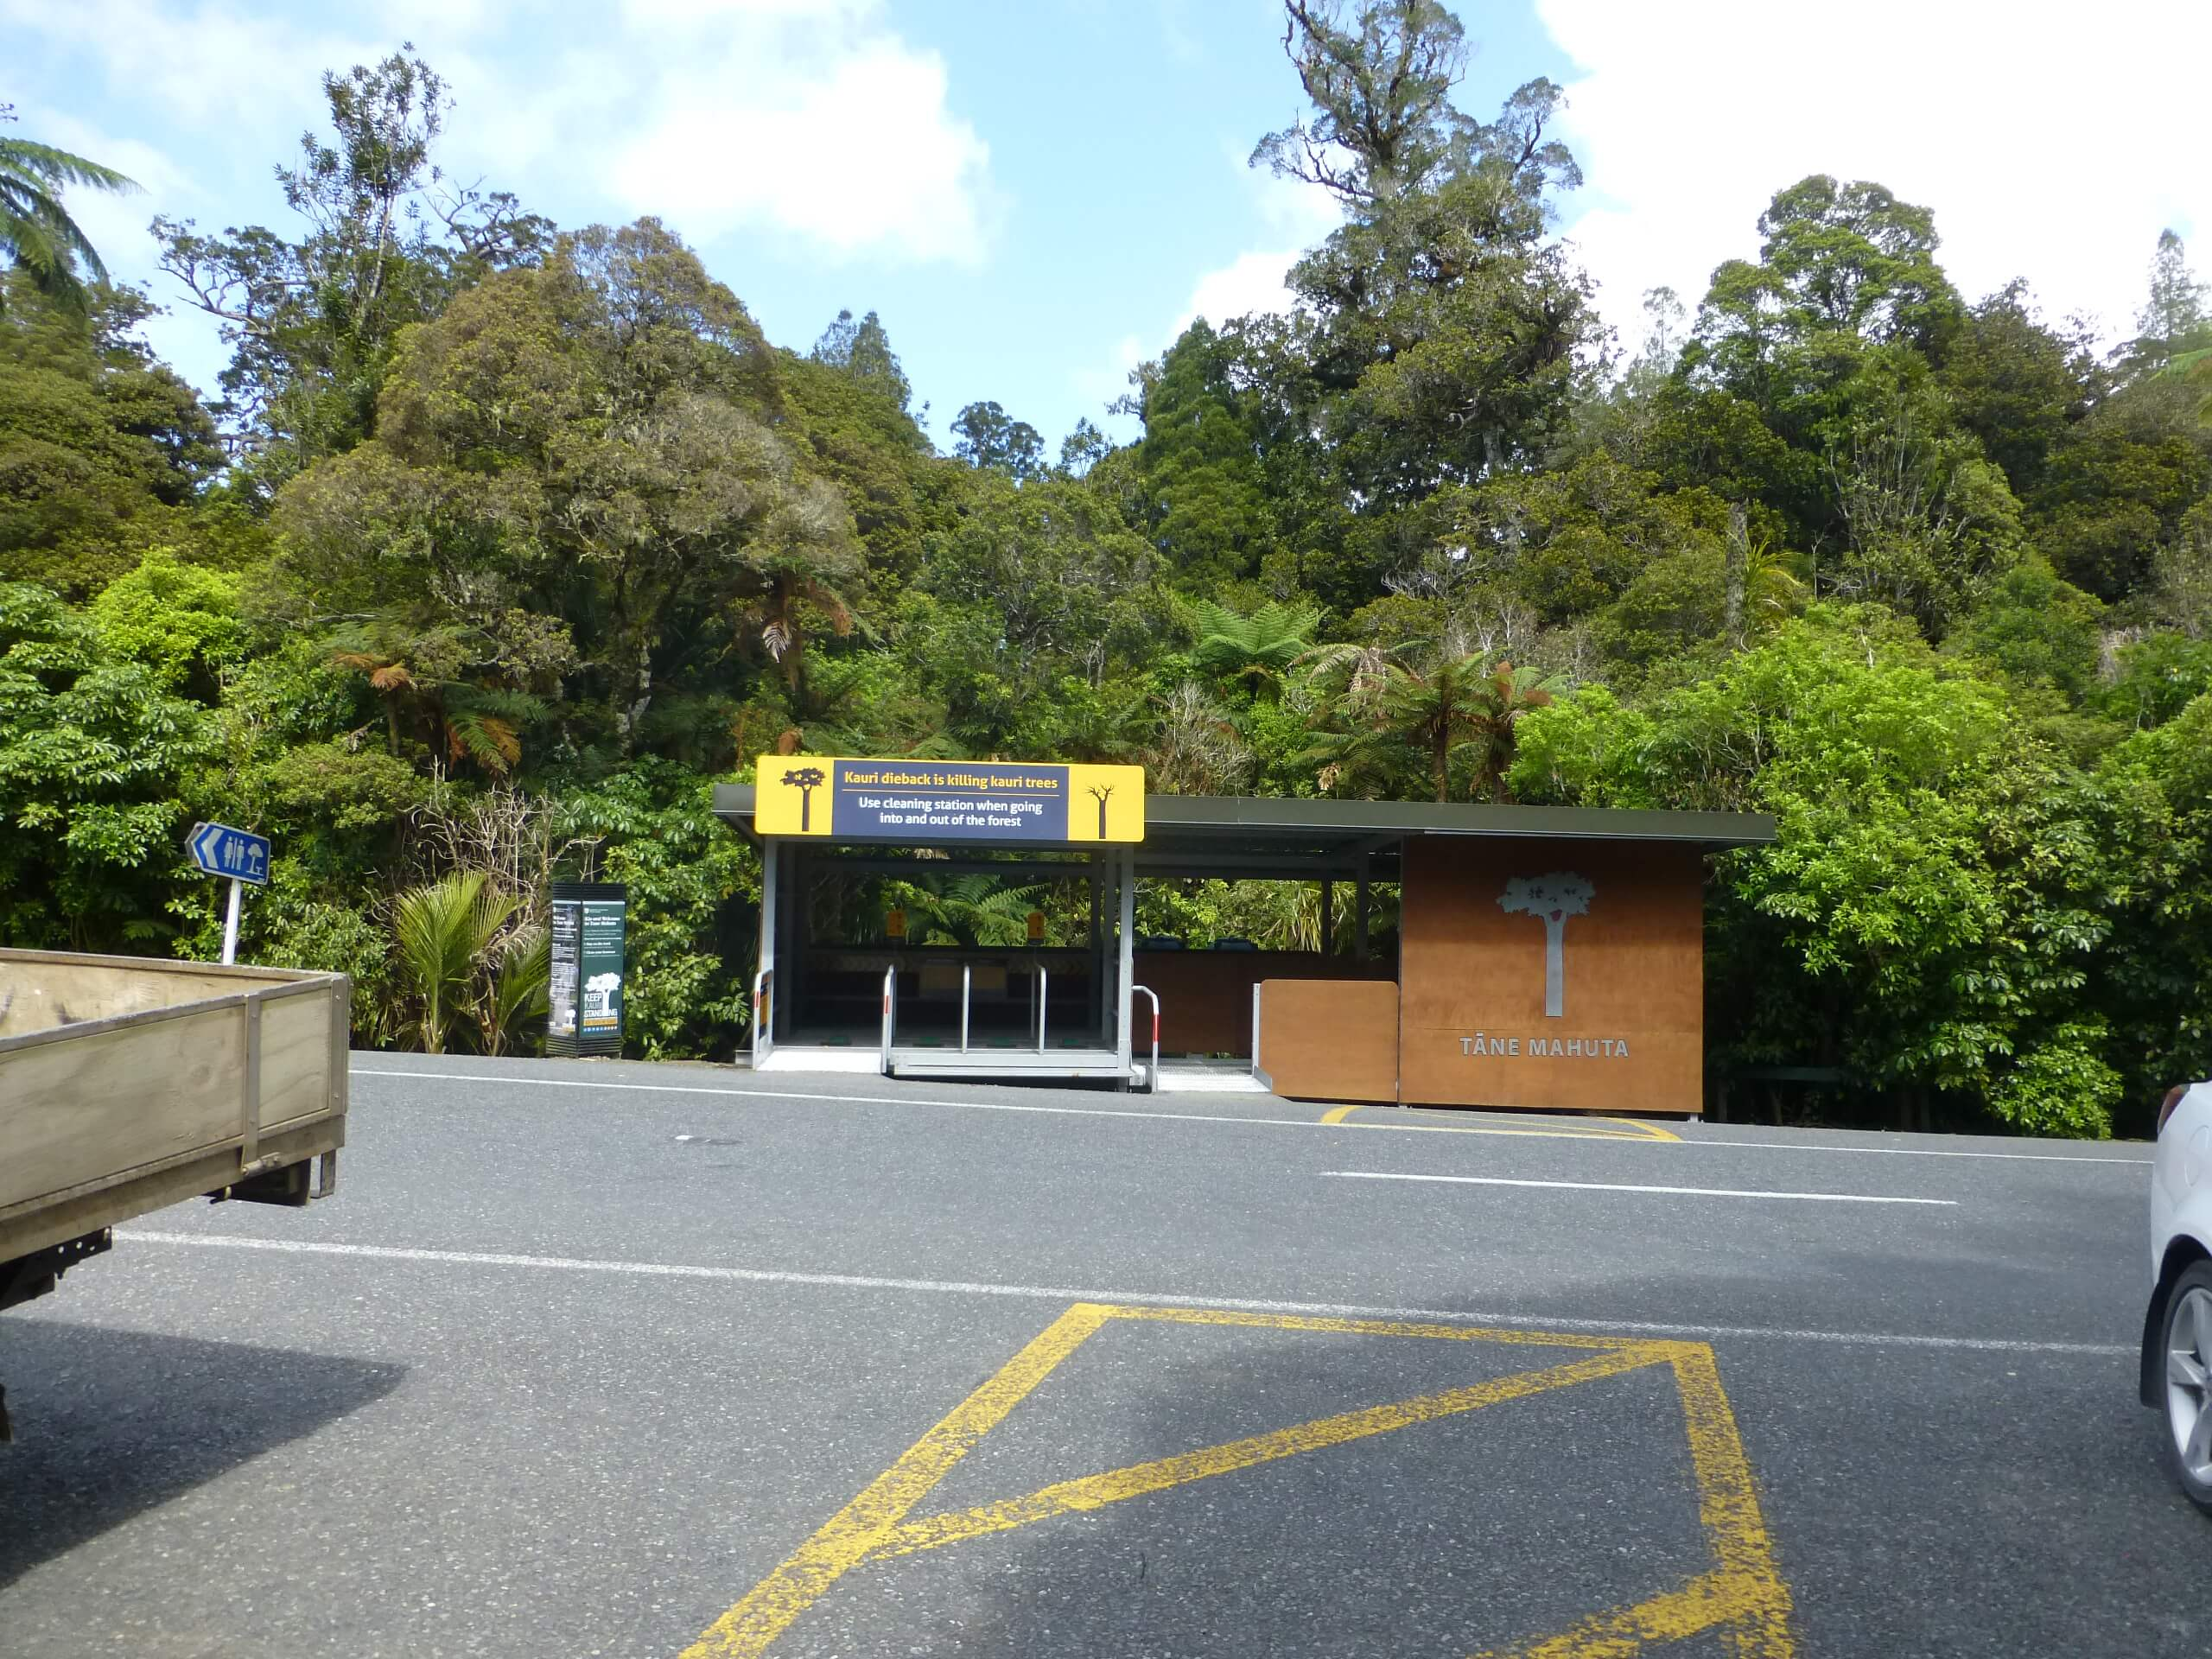 weit weg reisen, Waipoua Forest, Tane Mahuta 2